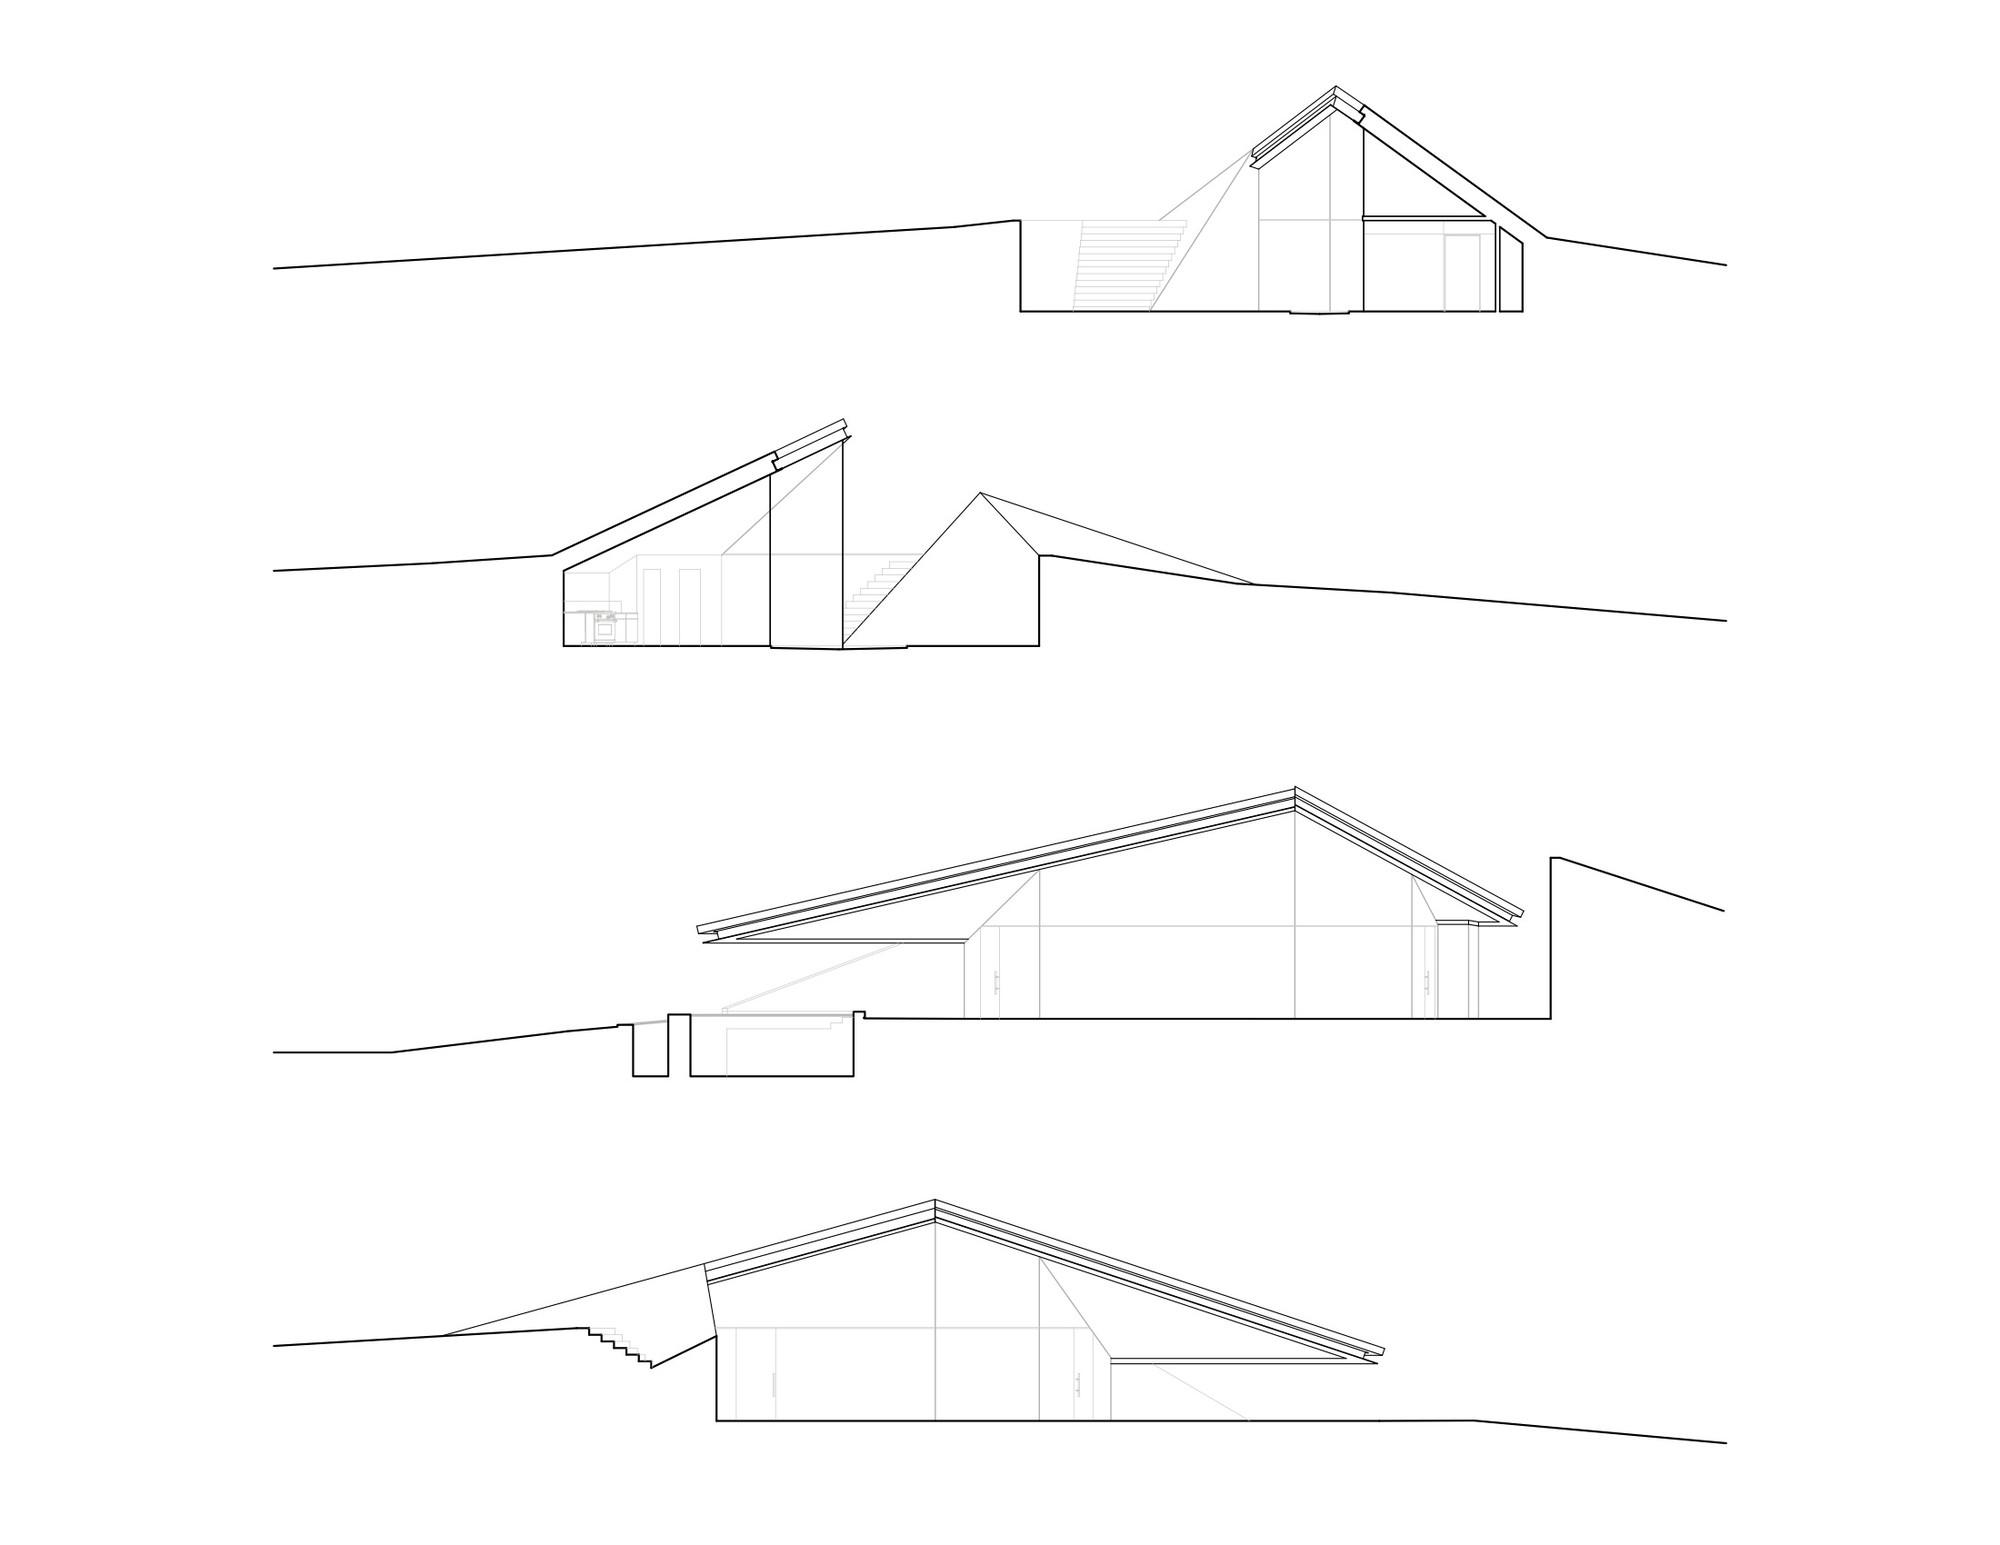 Edgeland House / Bercy Chen Studio